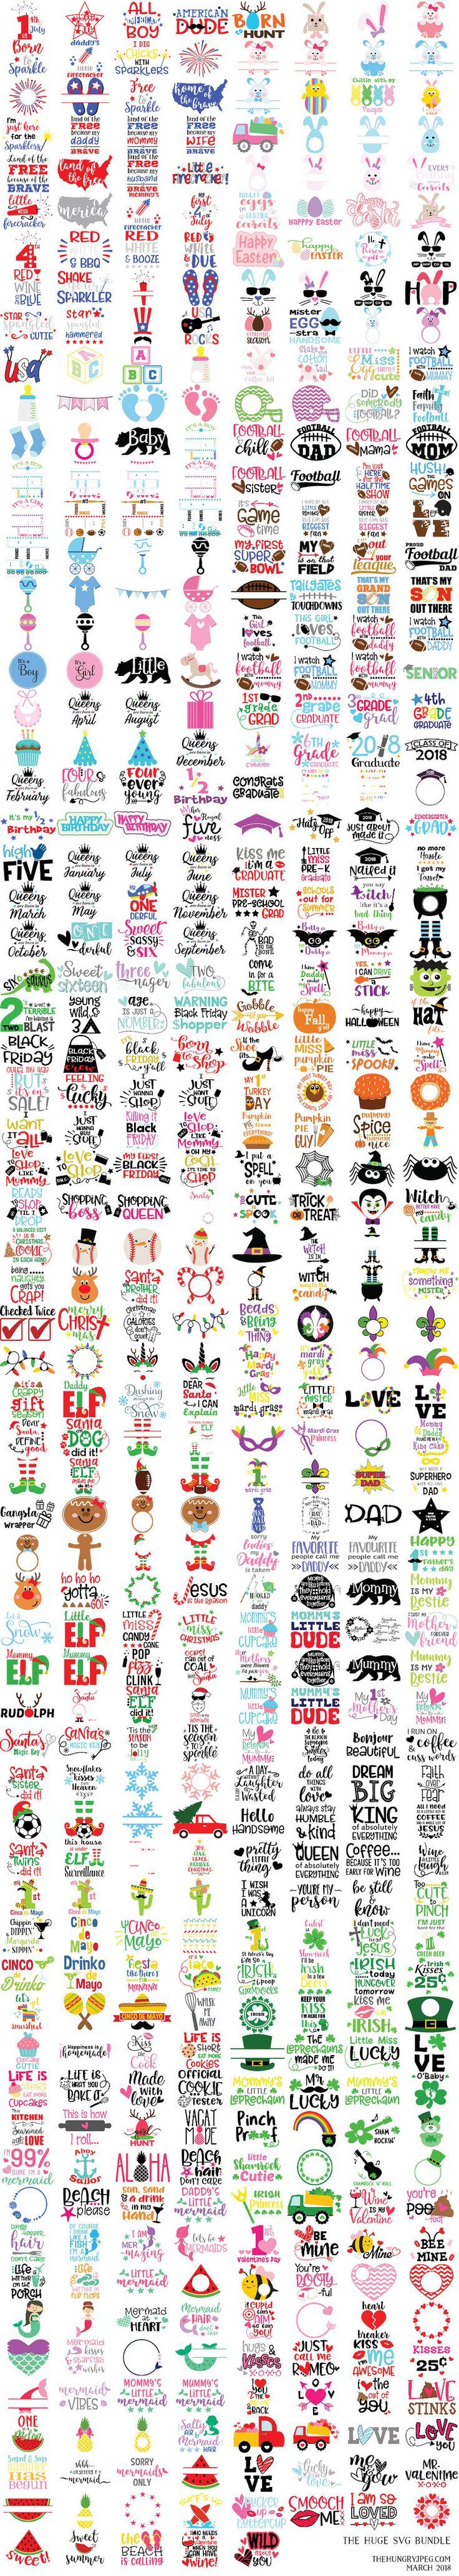 The Huge SVG Bundle by TheHungryJPEG   TheHungryJPEG.com